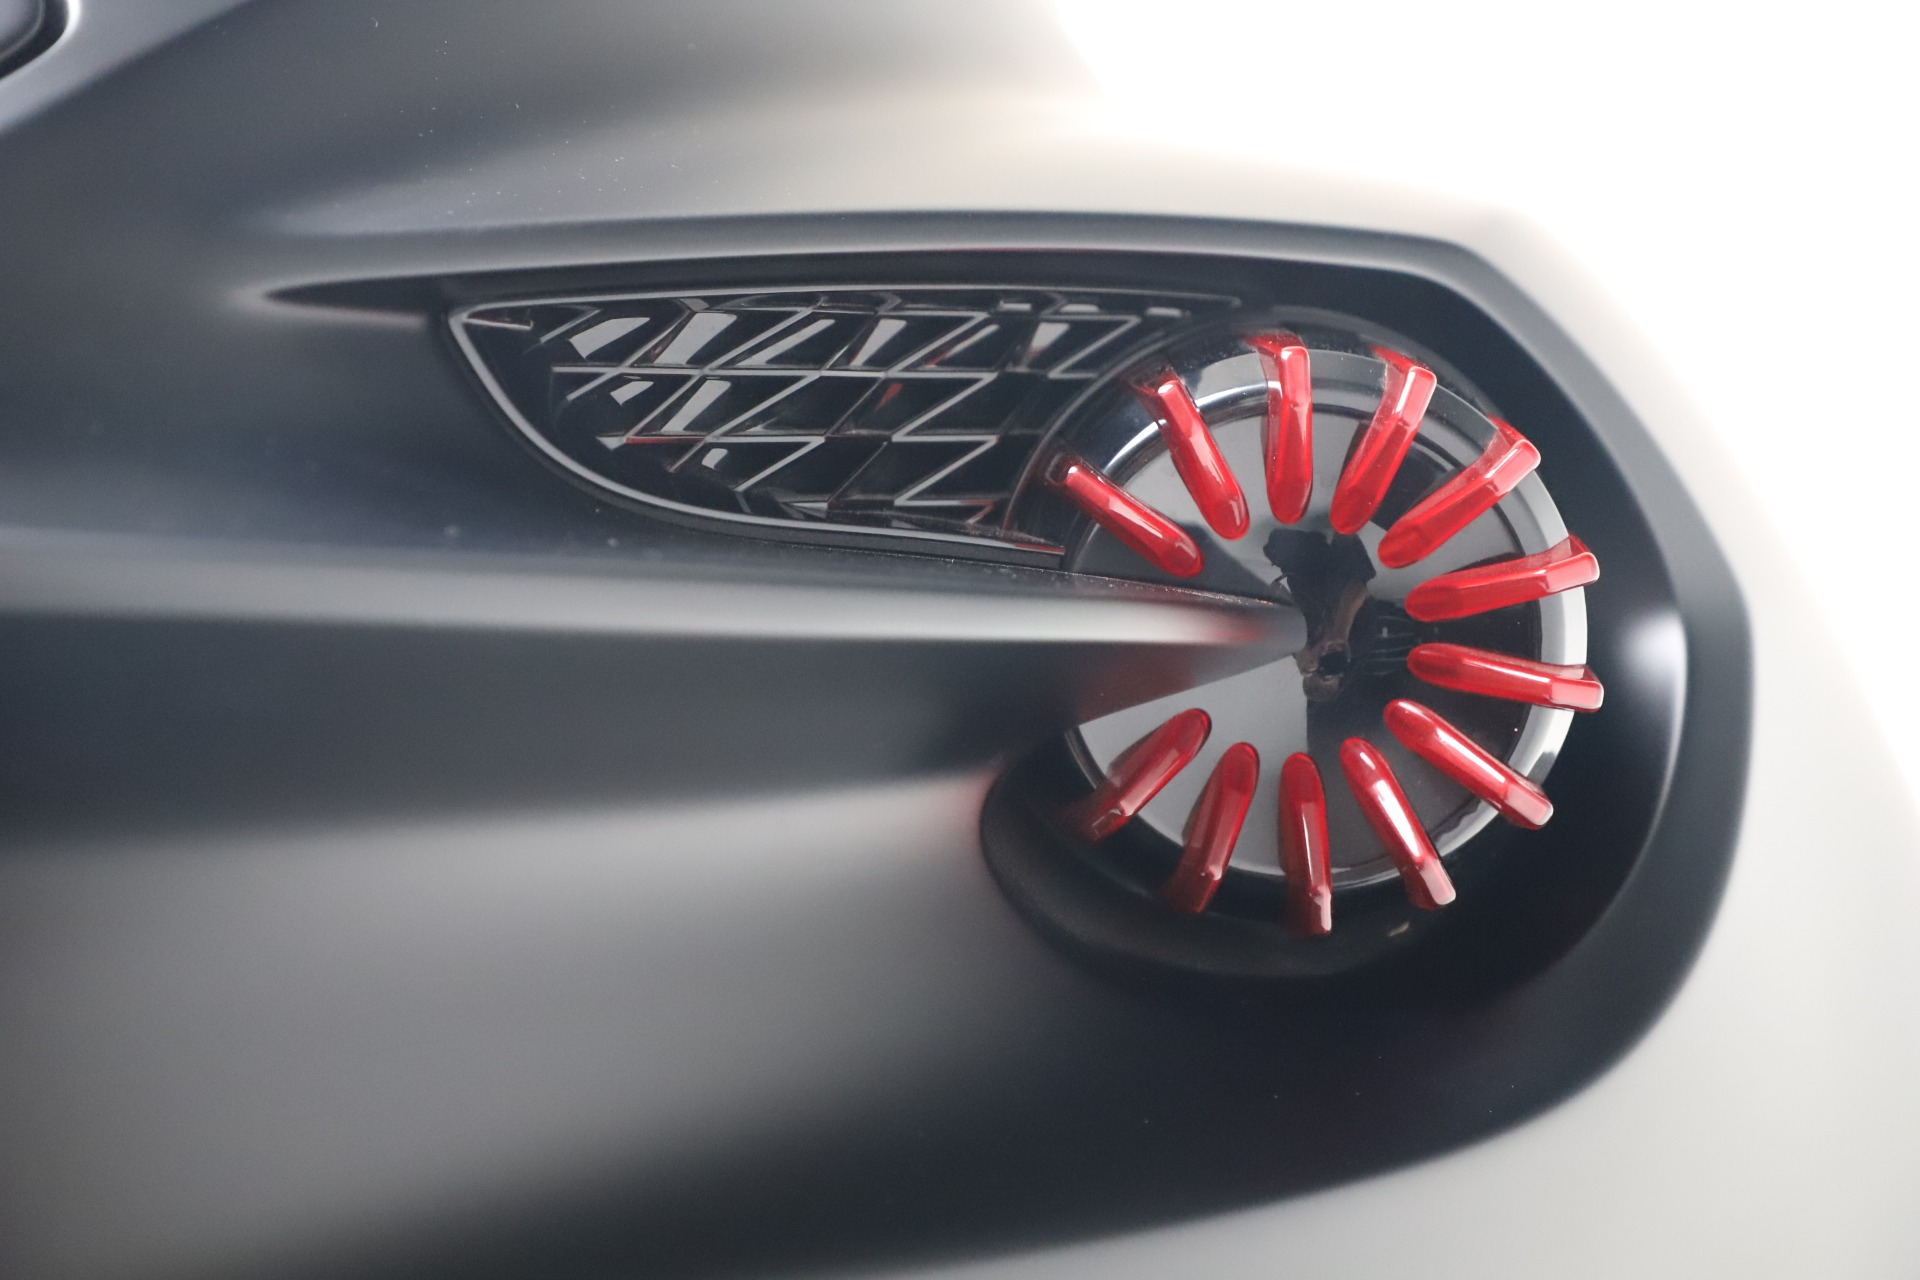 New 2019 Aston Martin Vanquish Shooting Brake For Sale In Westport, CT 3512_p33